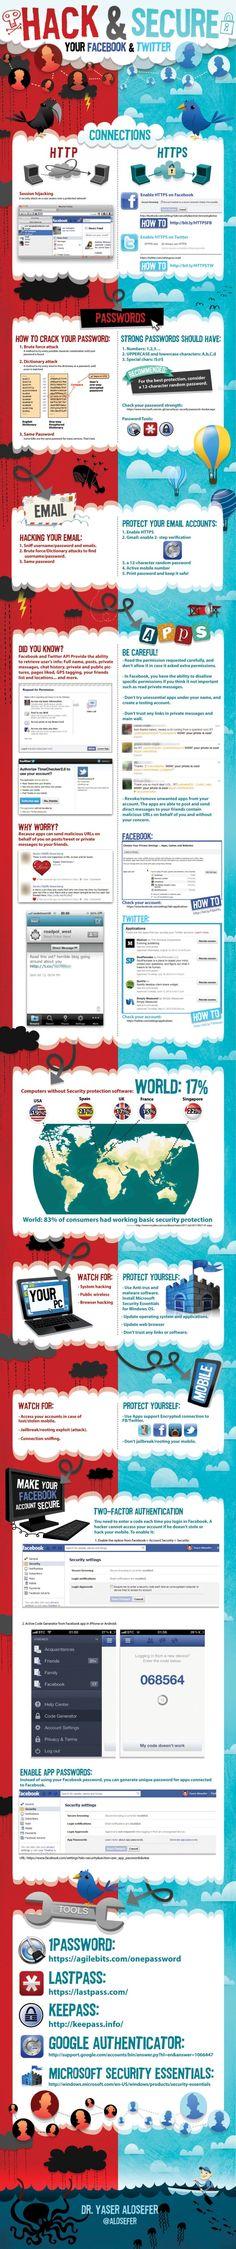 Hack & Secure your @Twitter & @Facebook. #infografia #infographic #SocialMedia